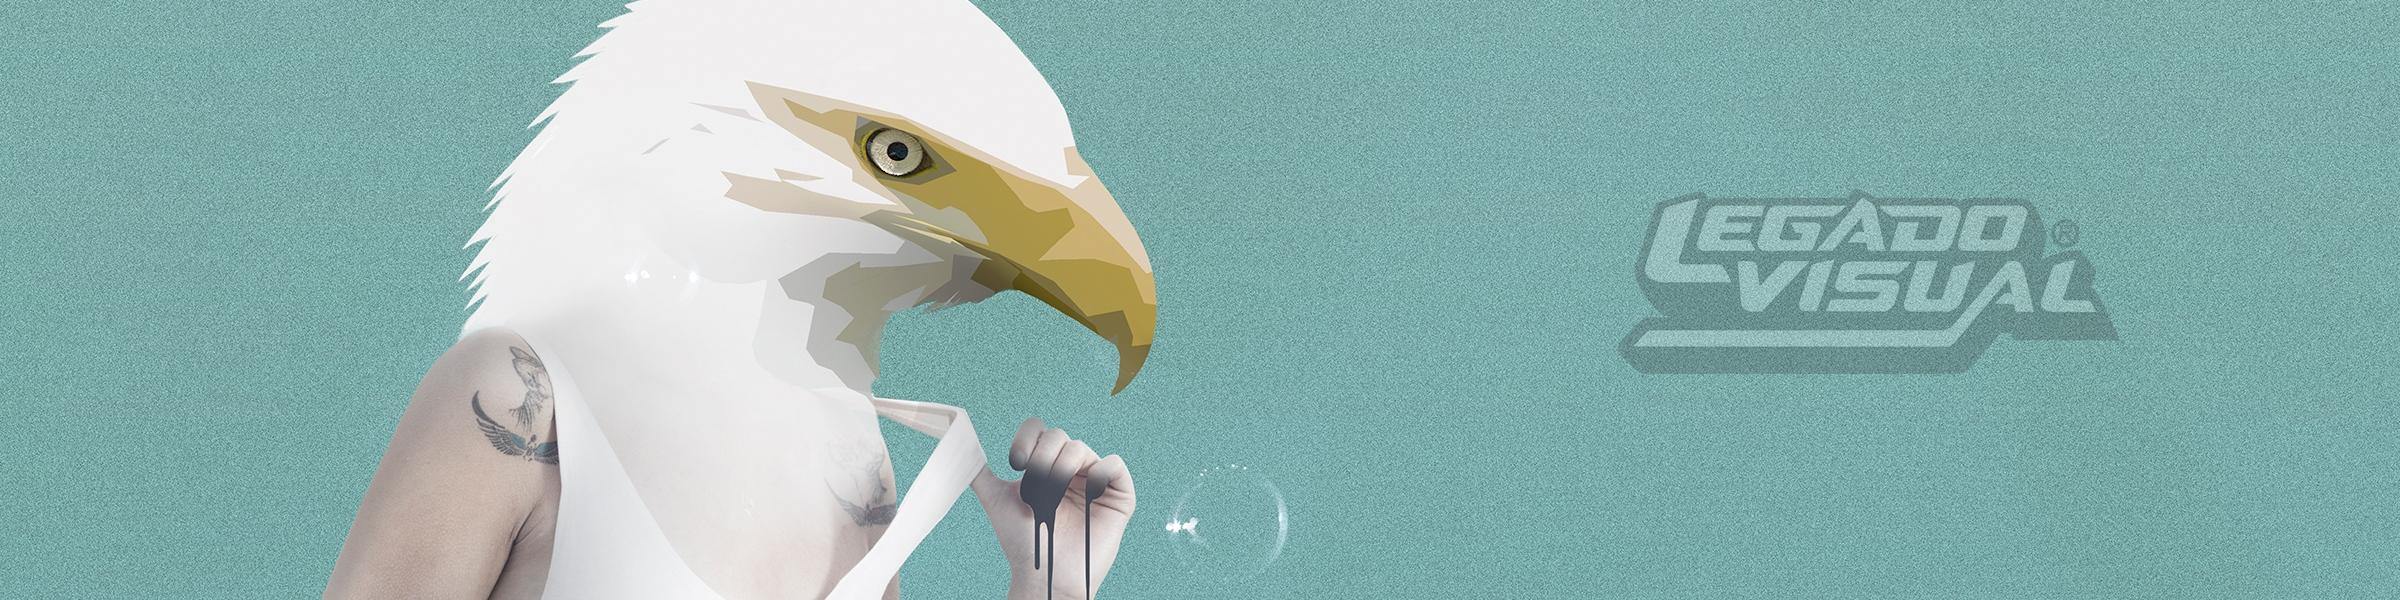 Legado Visual (@legadovisual) Cover Image